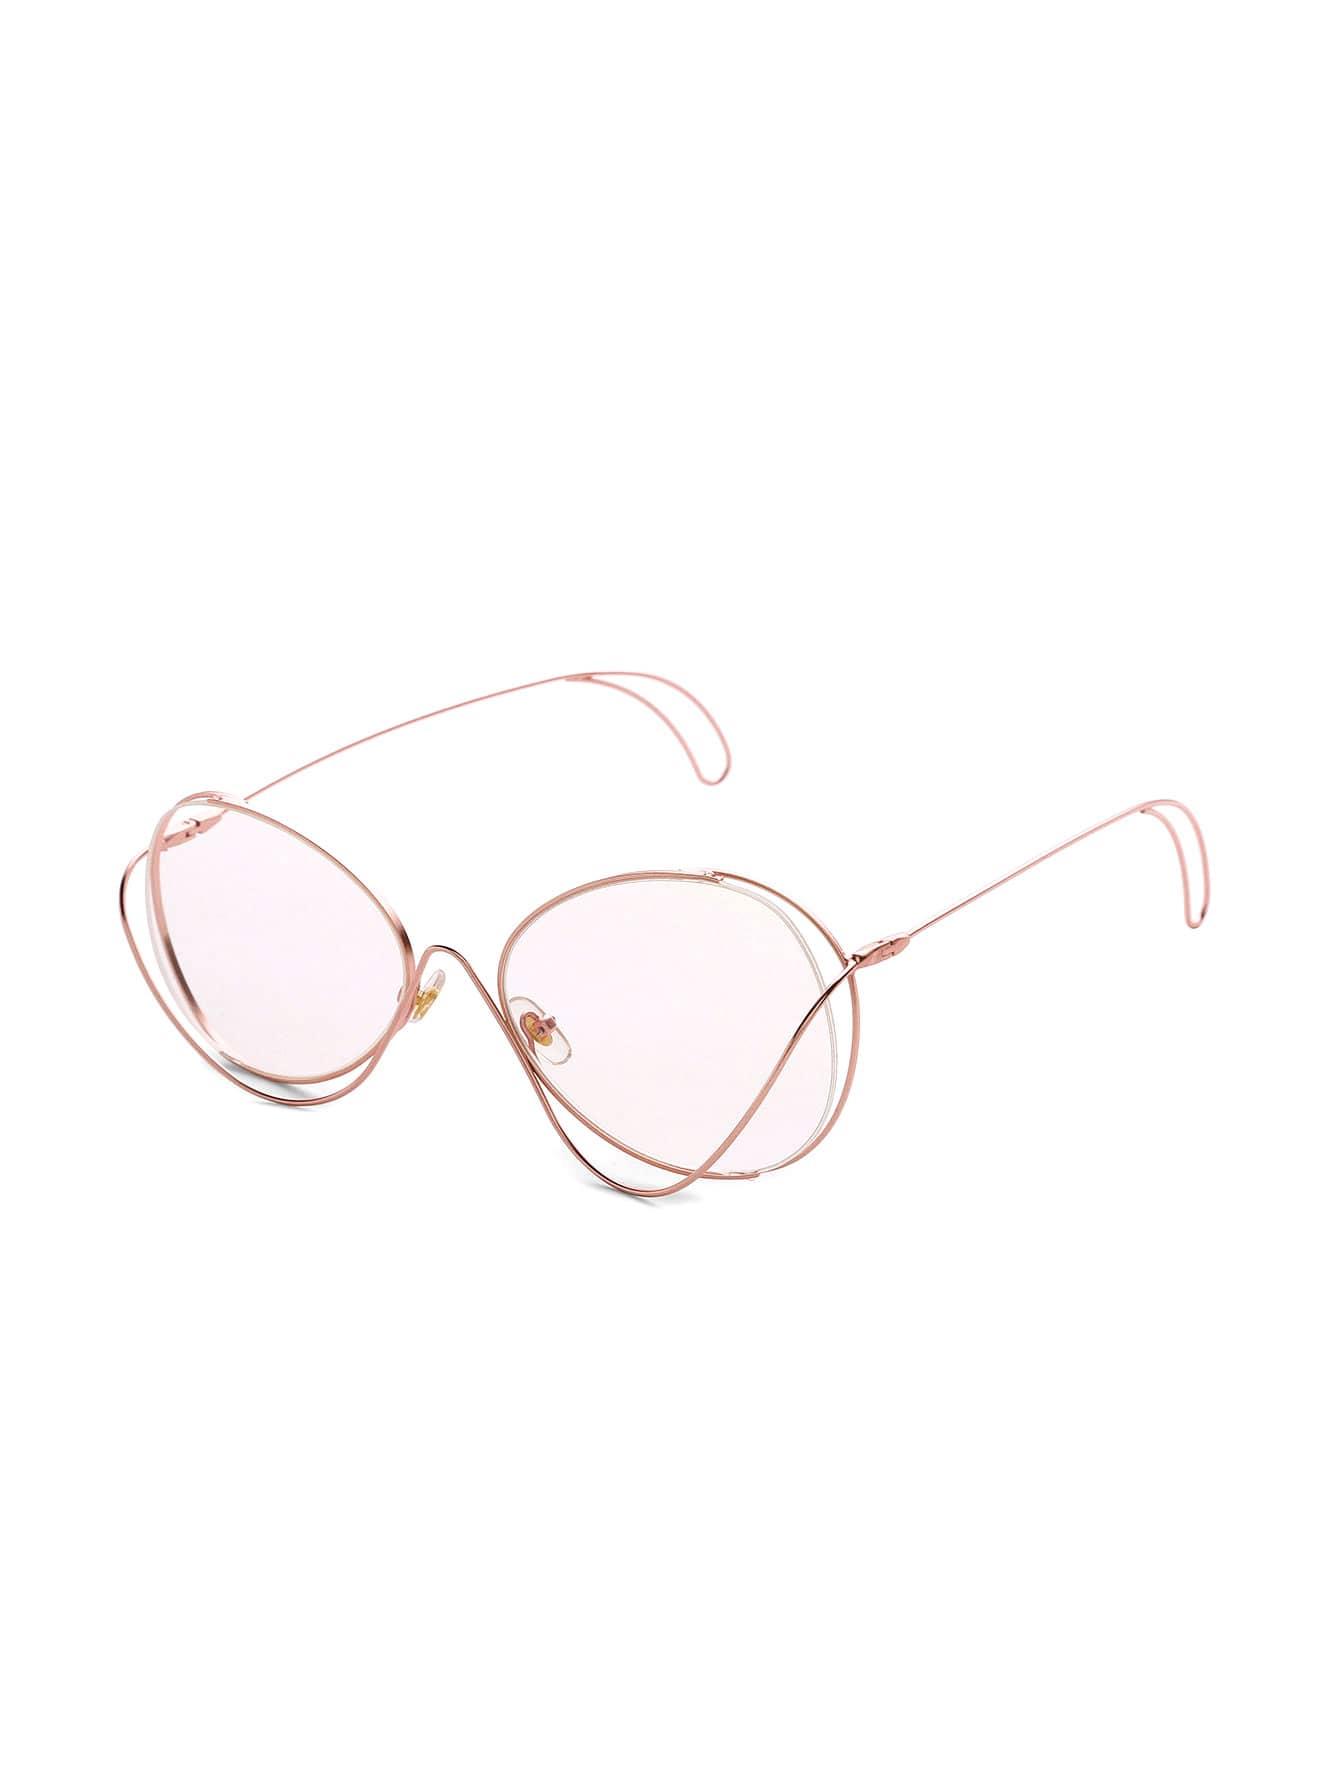 Фото Asymmetrical Frame Oval Lens Glasses. Купить с доставкой